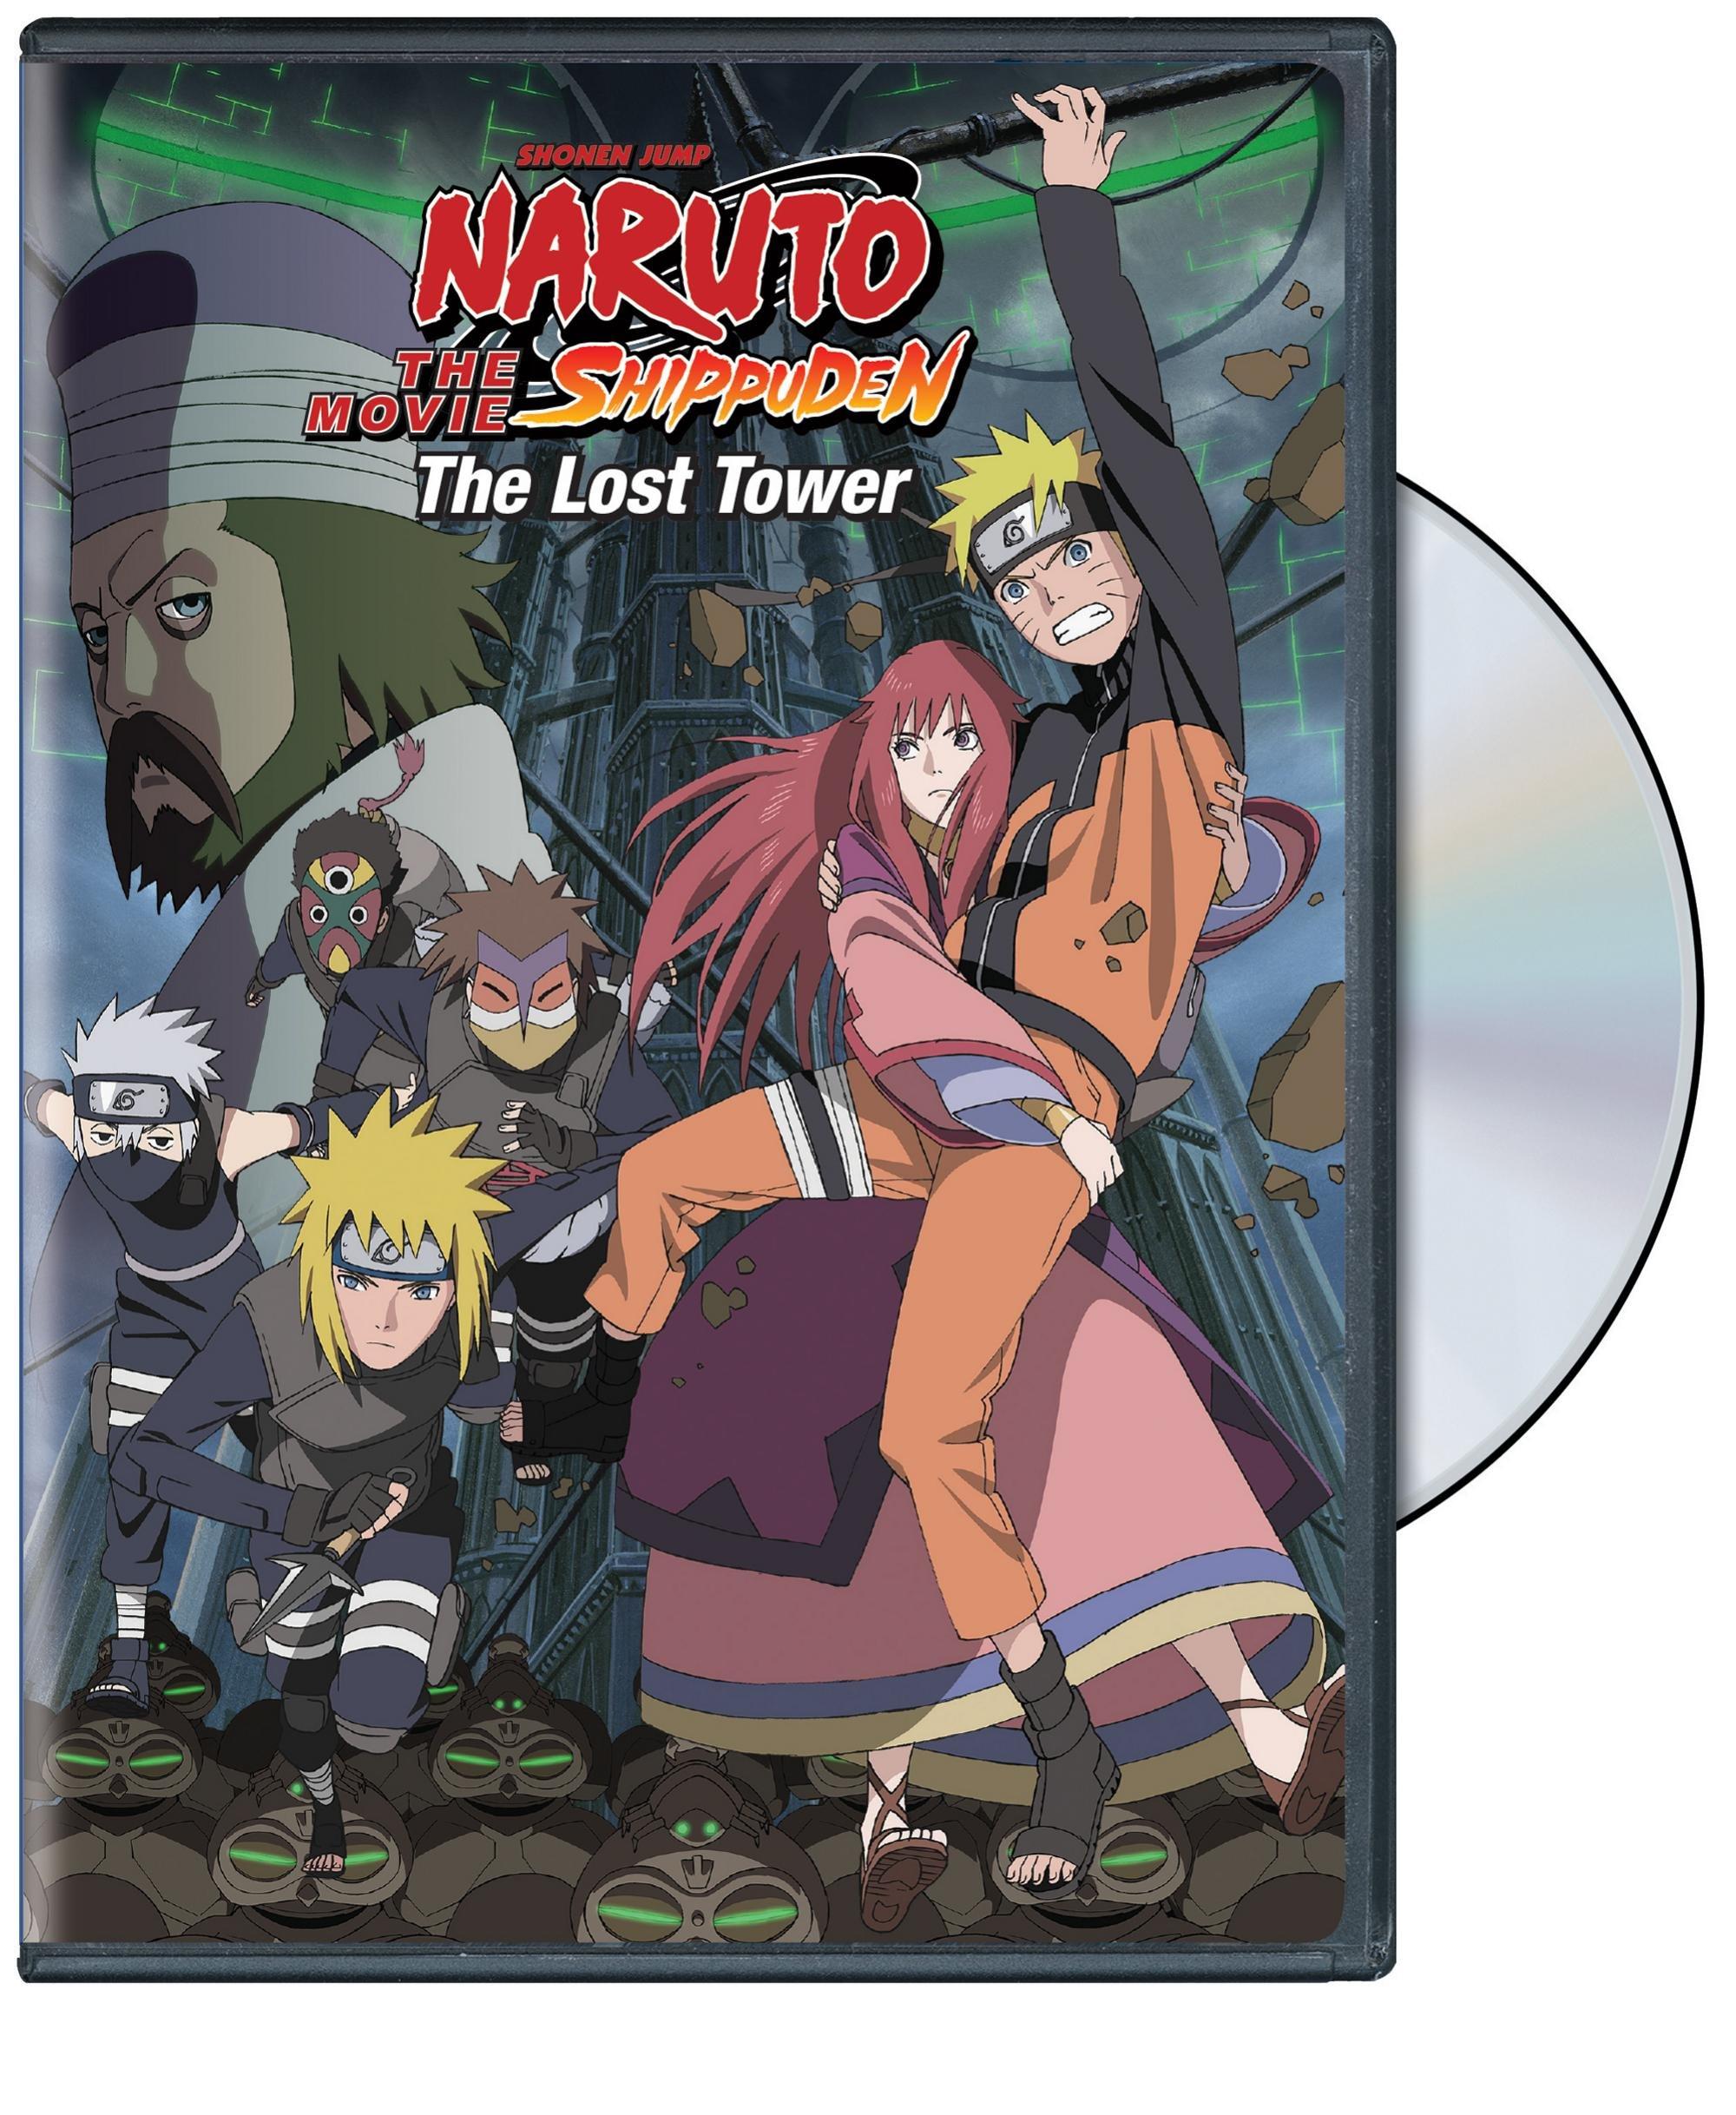 Amazon Naruto Shippuden The Movie